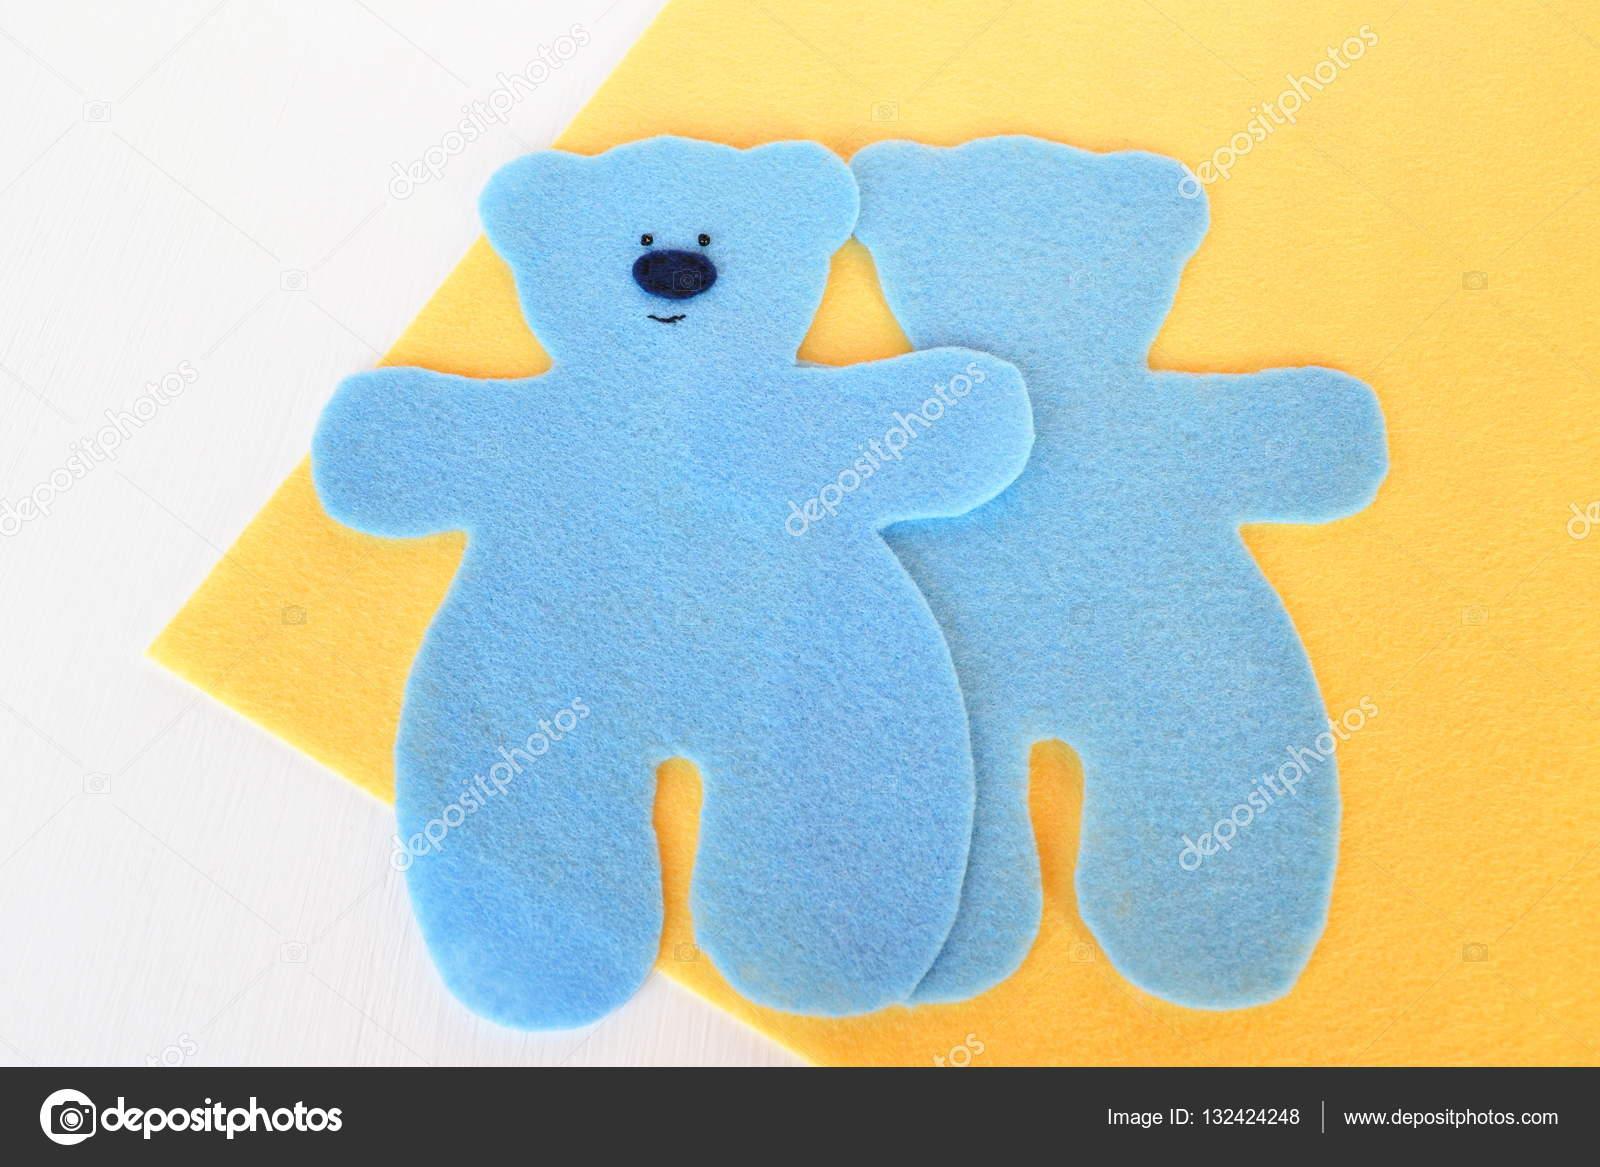 Handgefertigte Filz Bär Set - blaue Filz Bär setzen auf gelbem ...